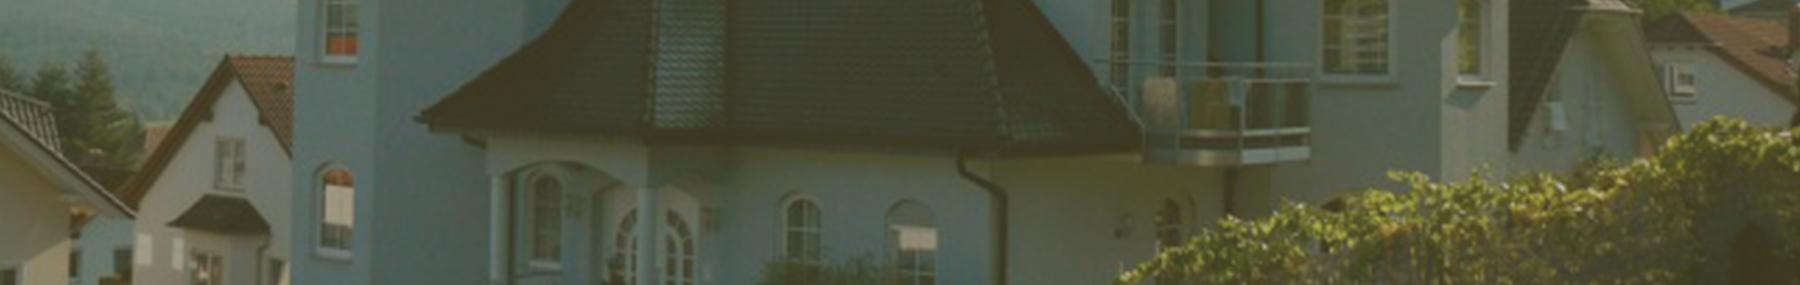 Privatvilla in Wächtersbach